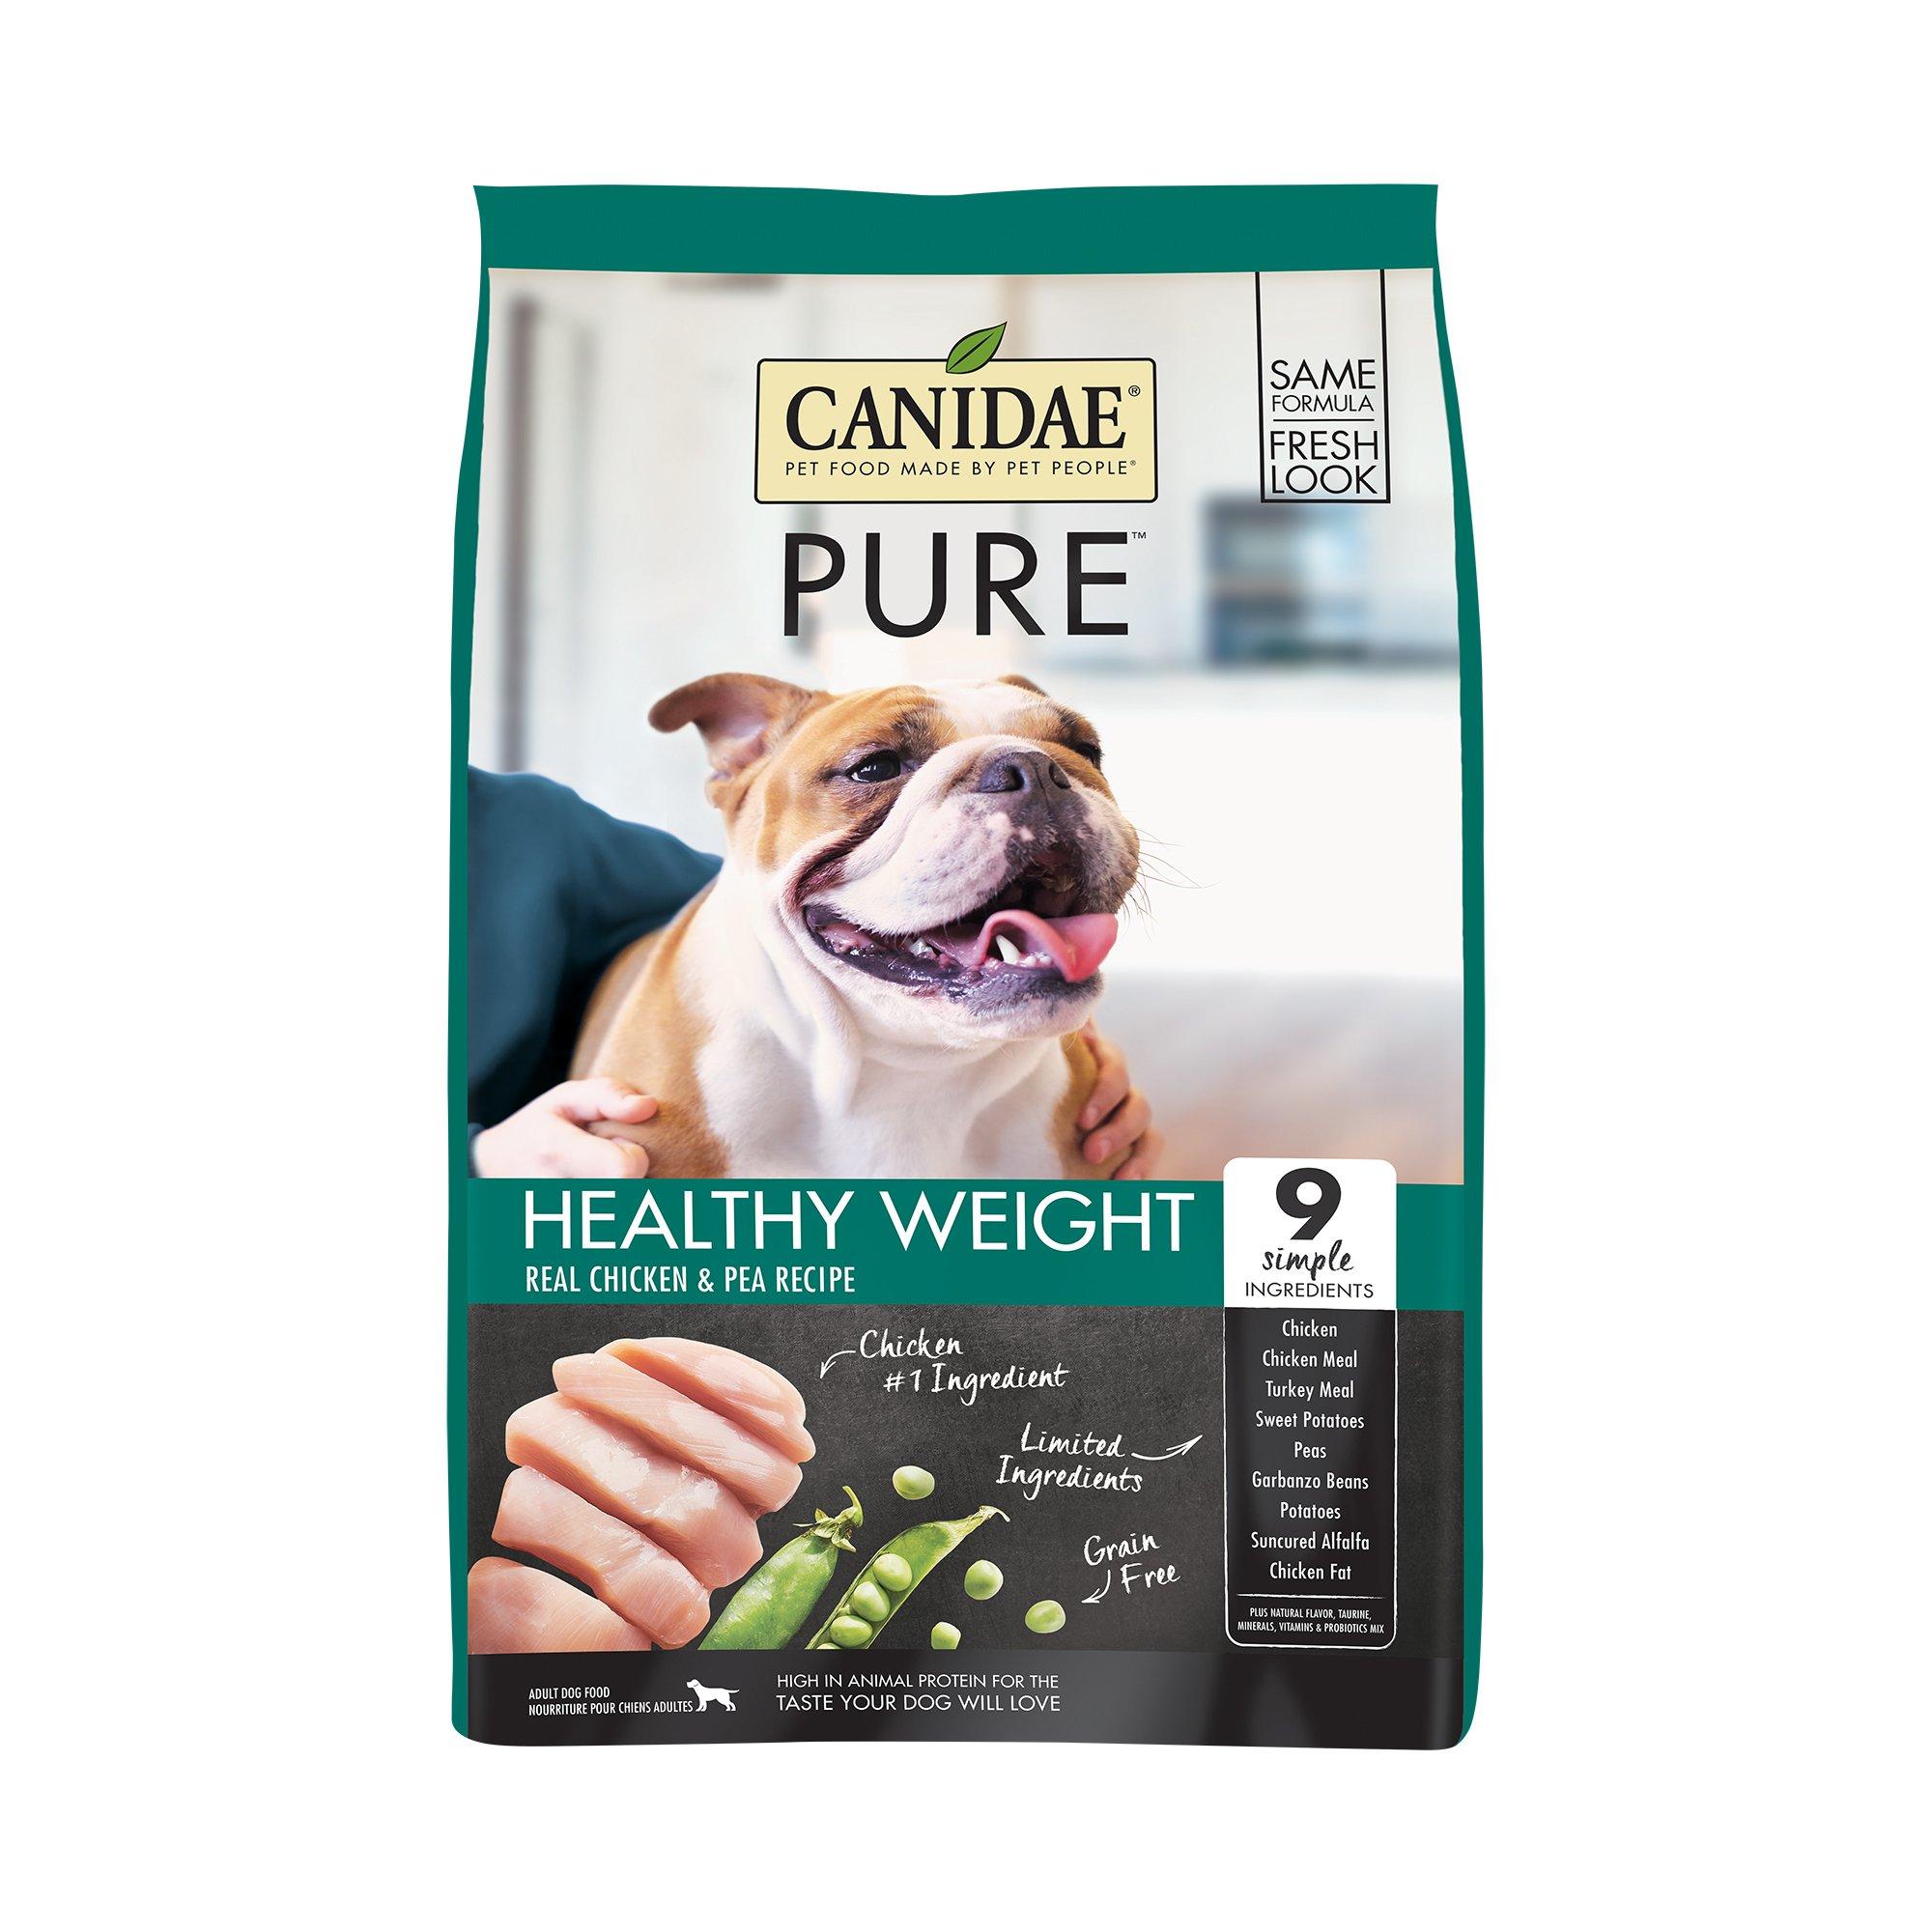 Petco Canidae Grain Free Dog Food